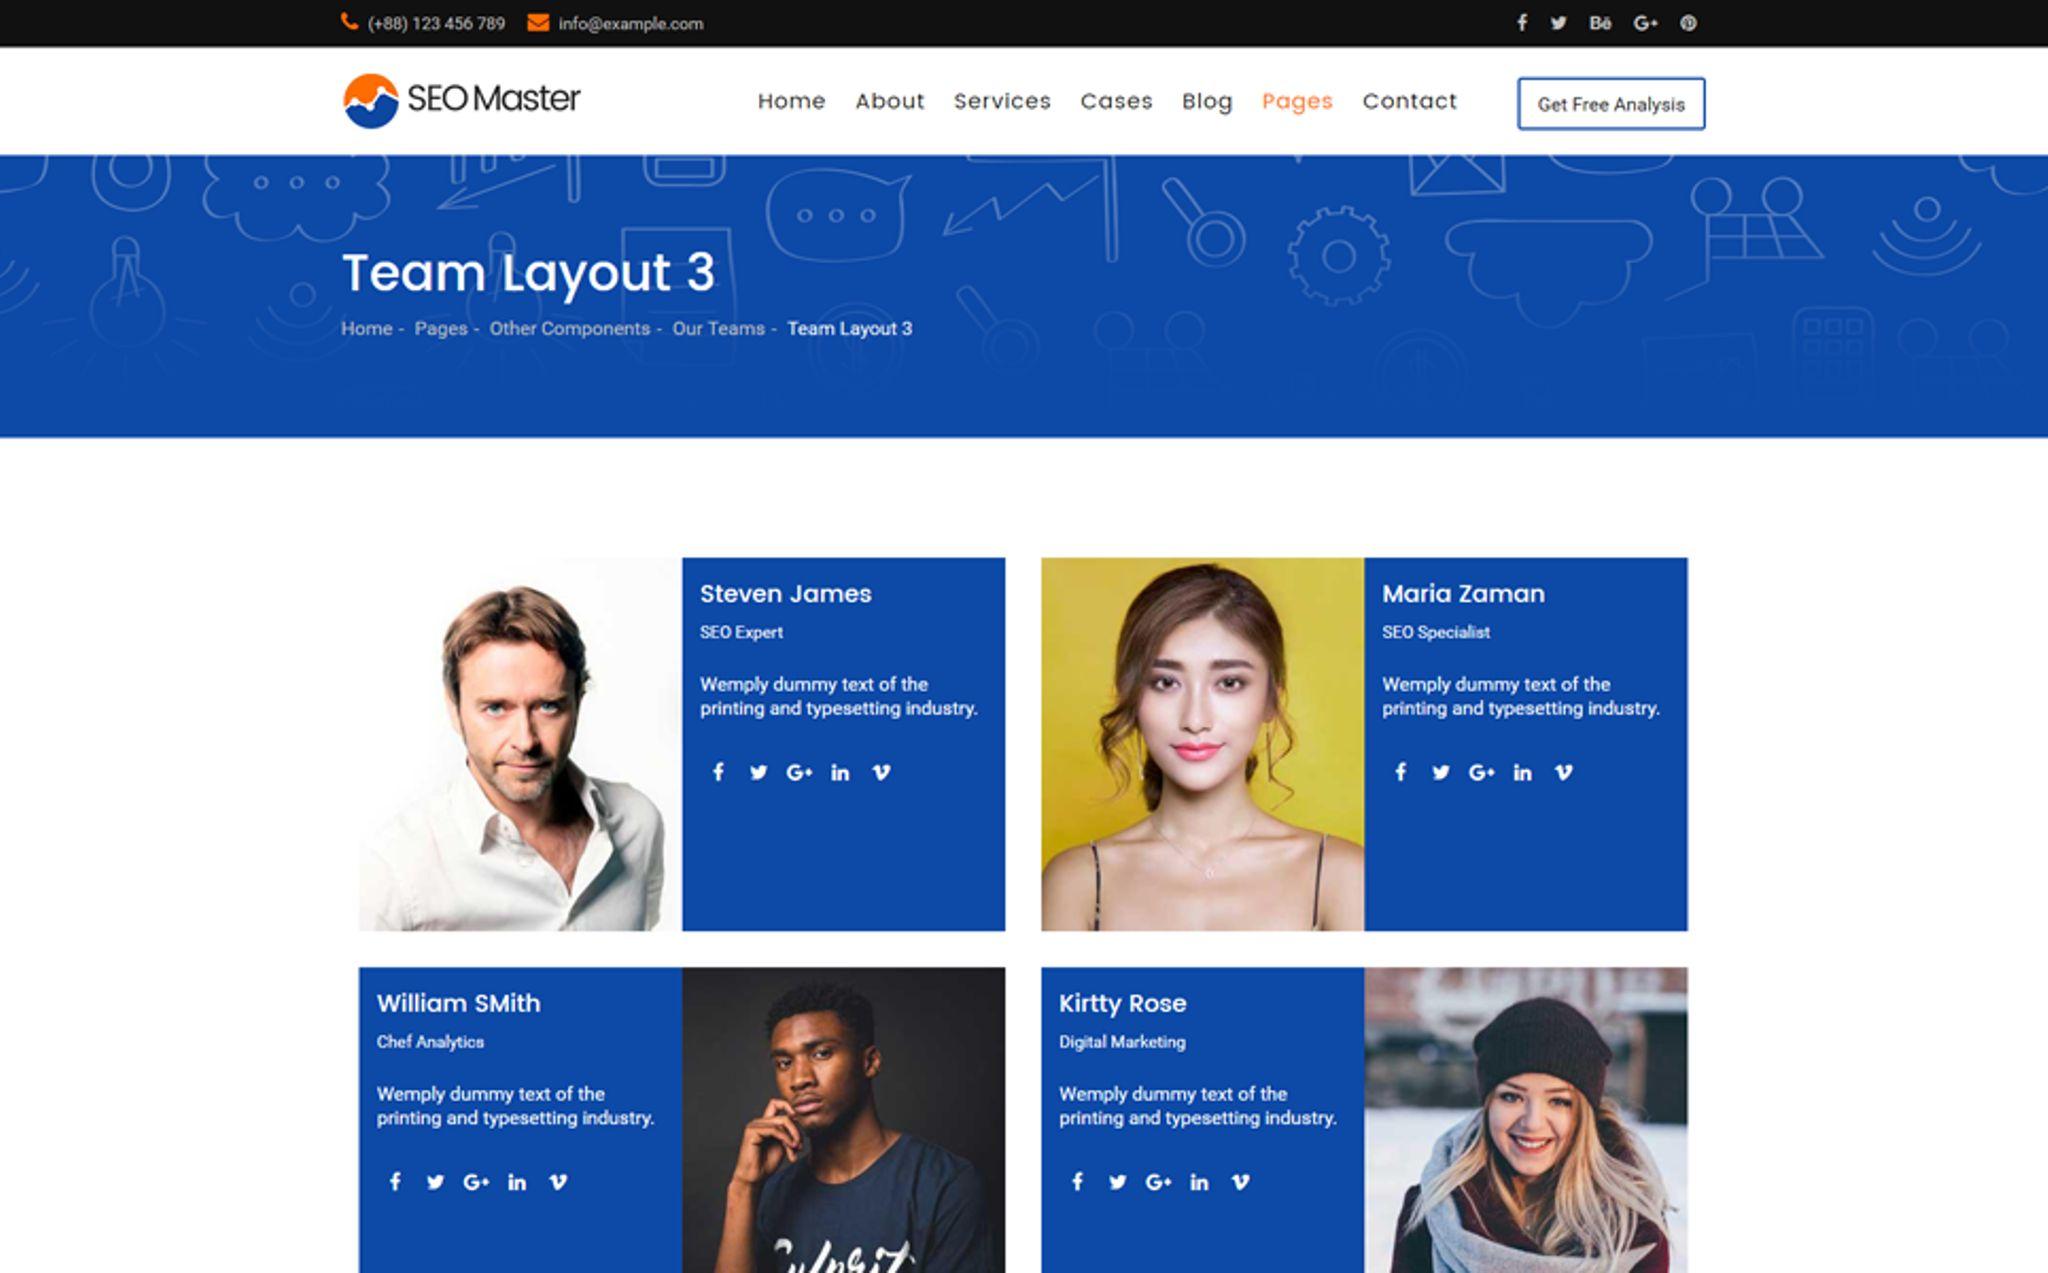 "SEO Master ¢€"" SEO & Digital Marketing Agency Website Template"